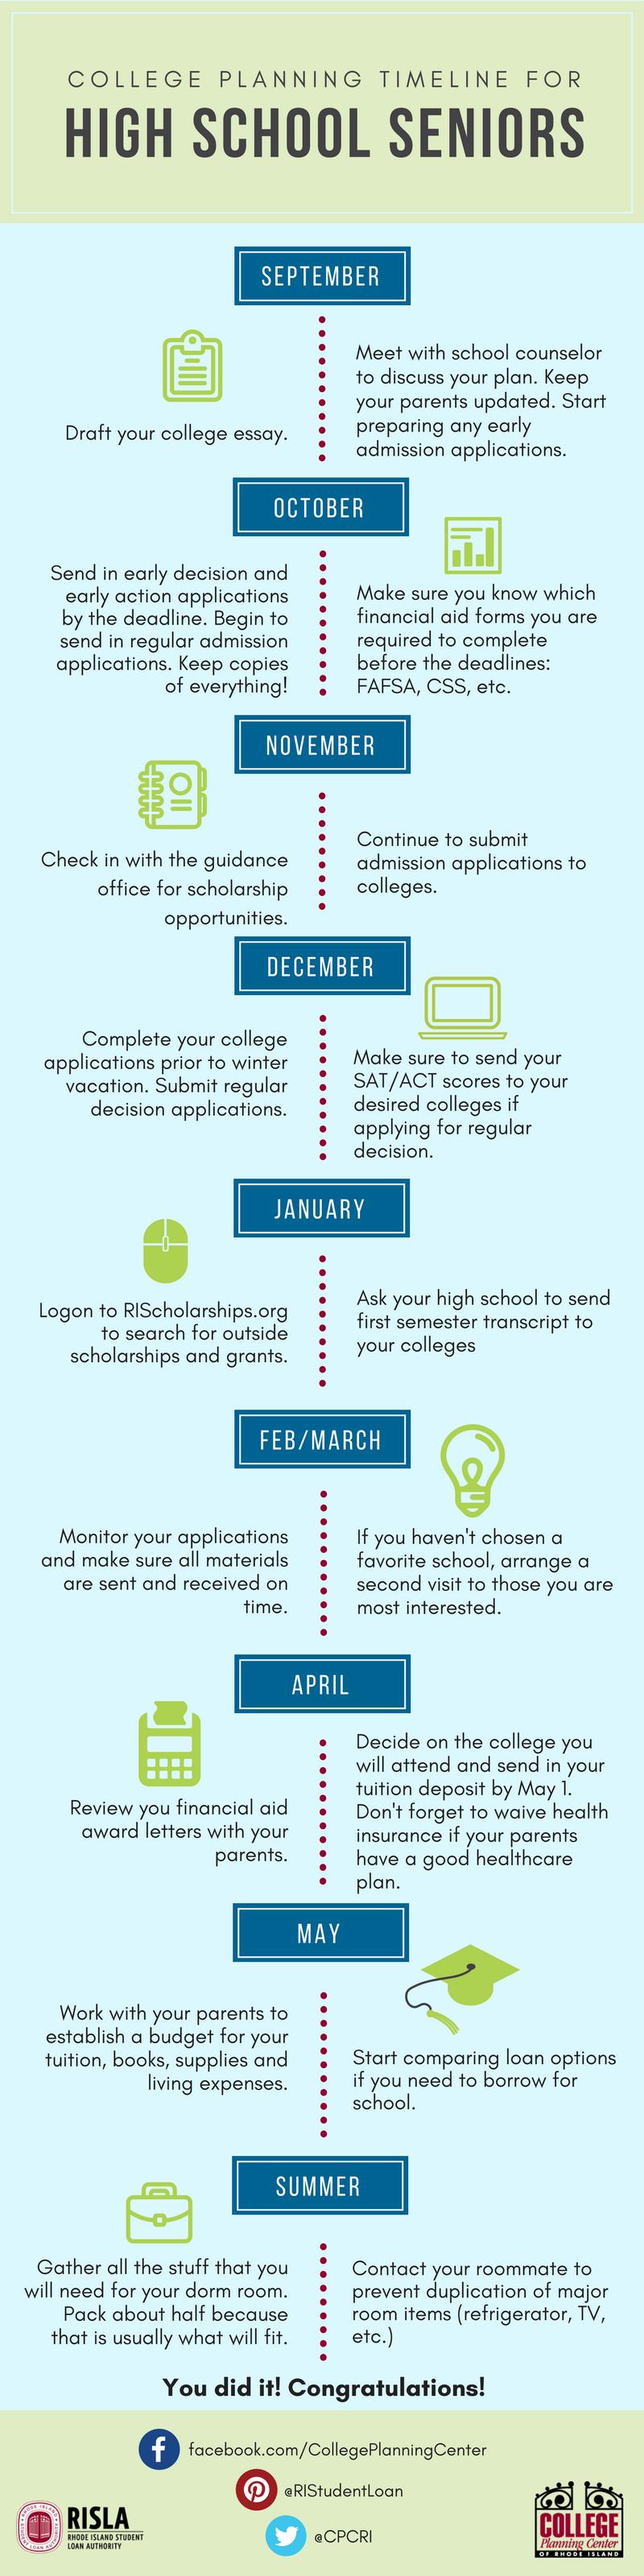 College Planning for High School Seniors